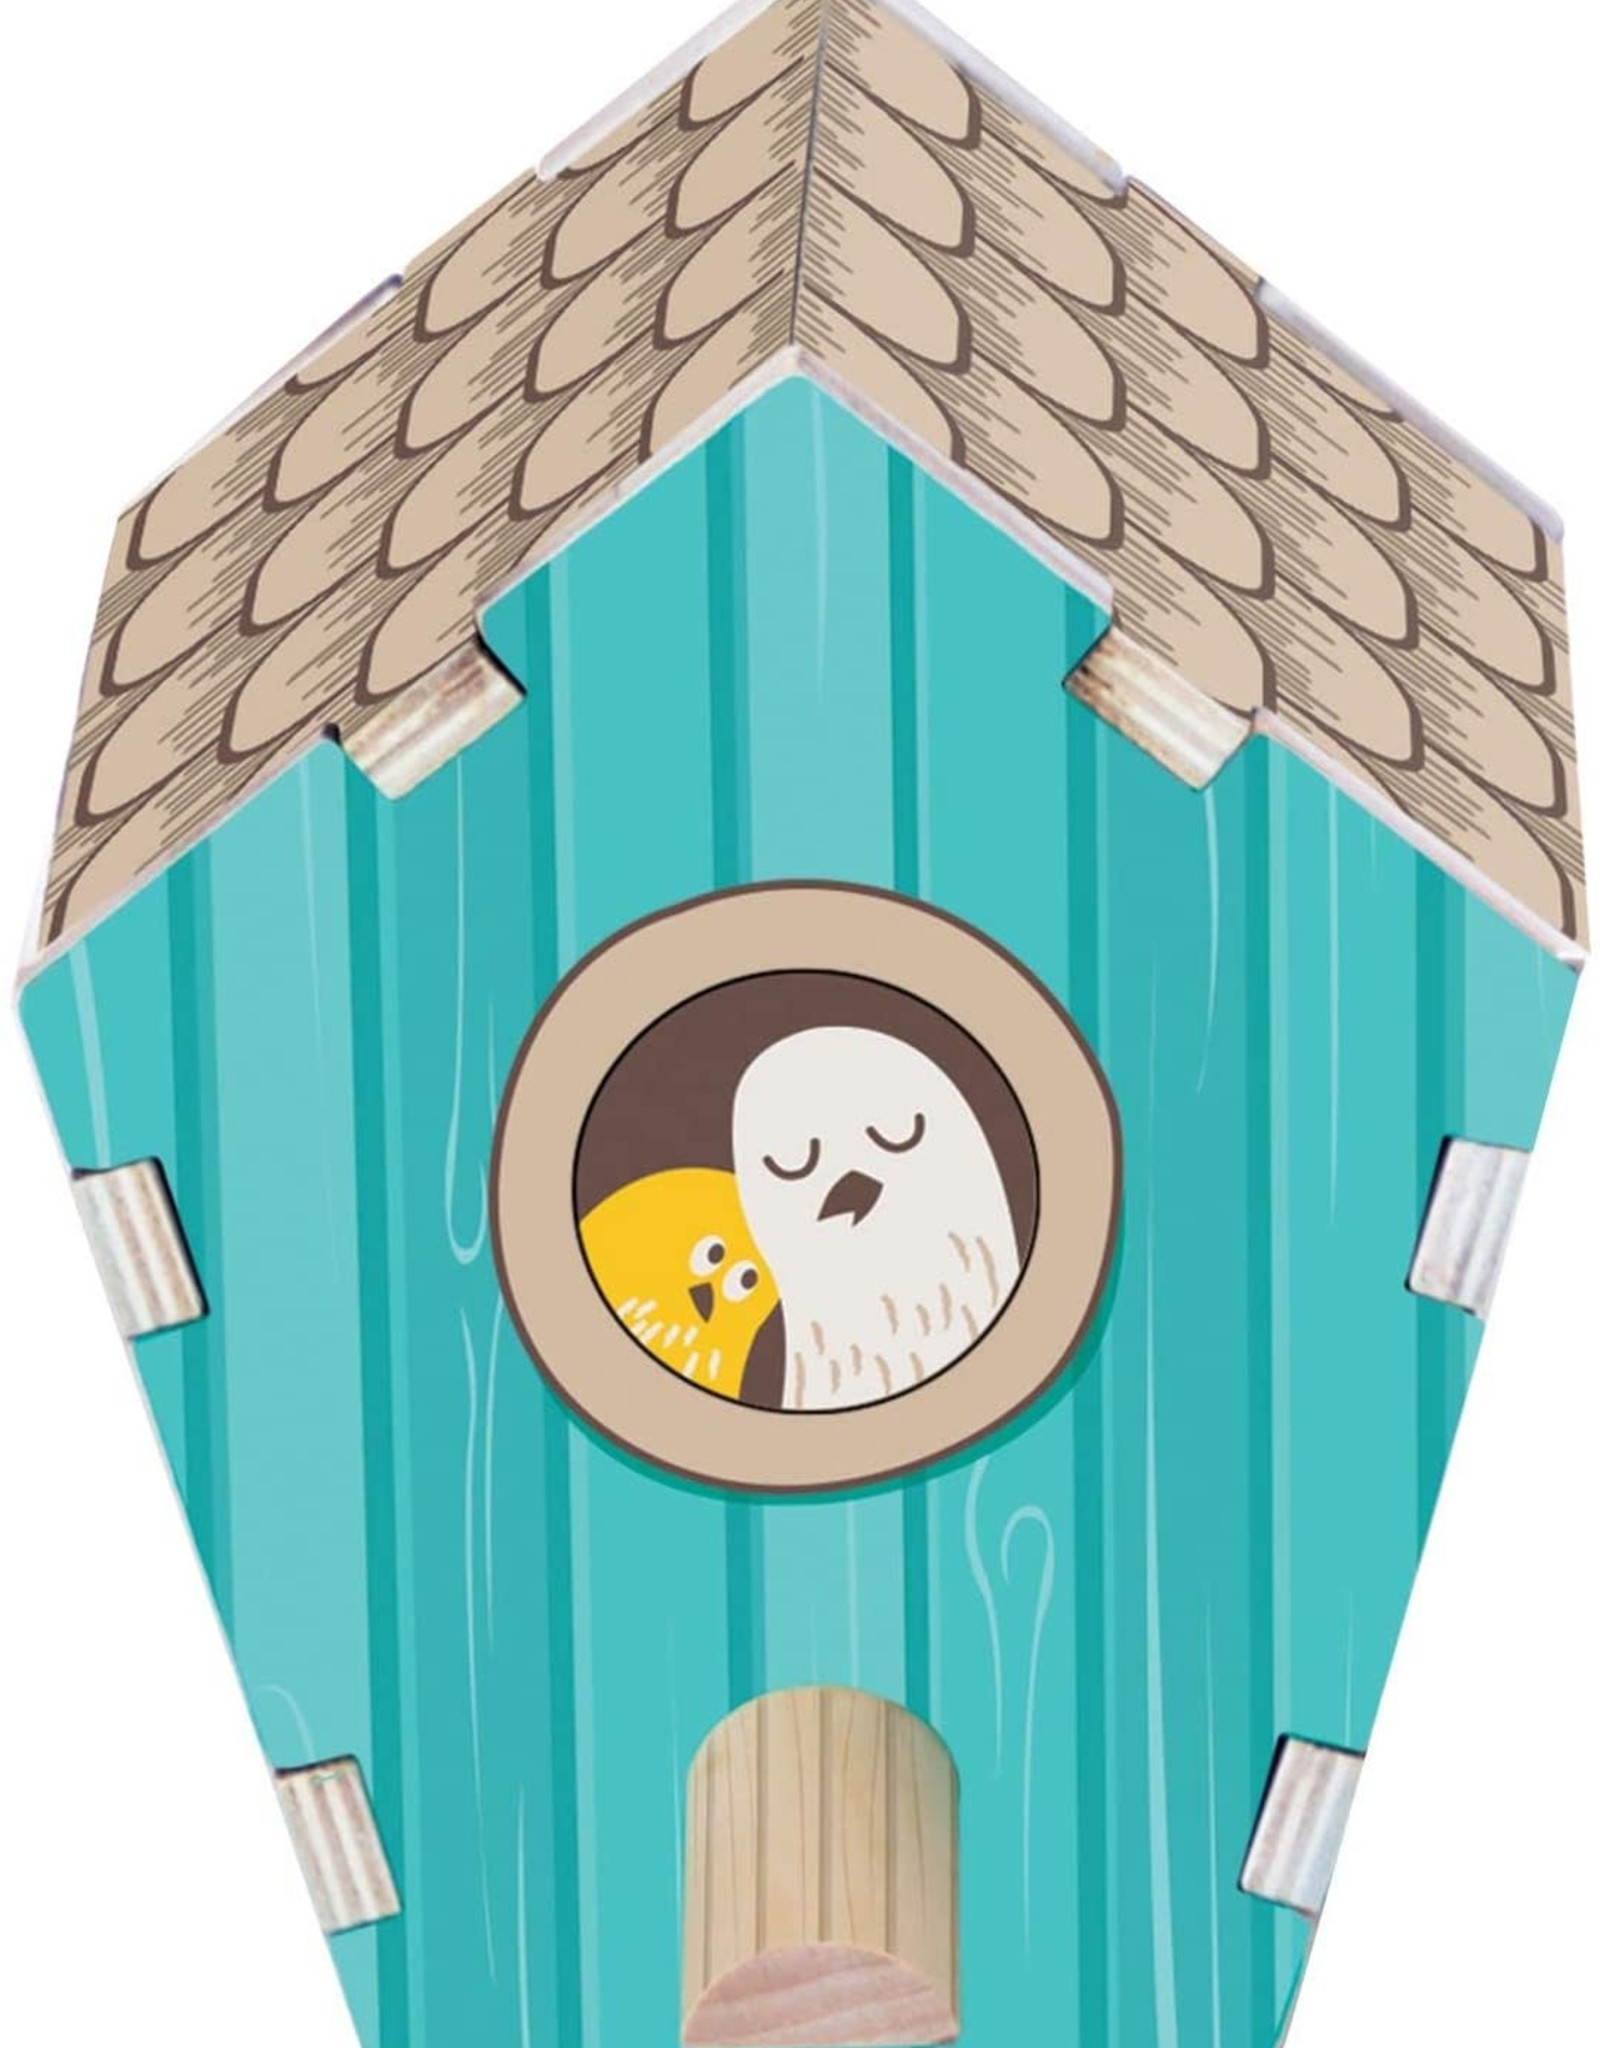 Fat Brain Toy Co. Build It: Blueprints - Bird House